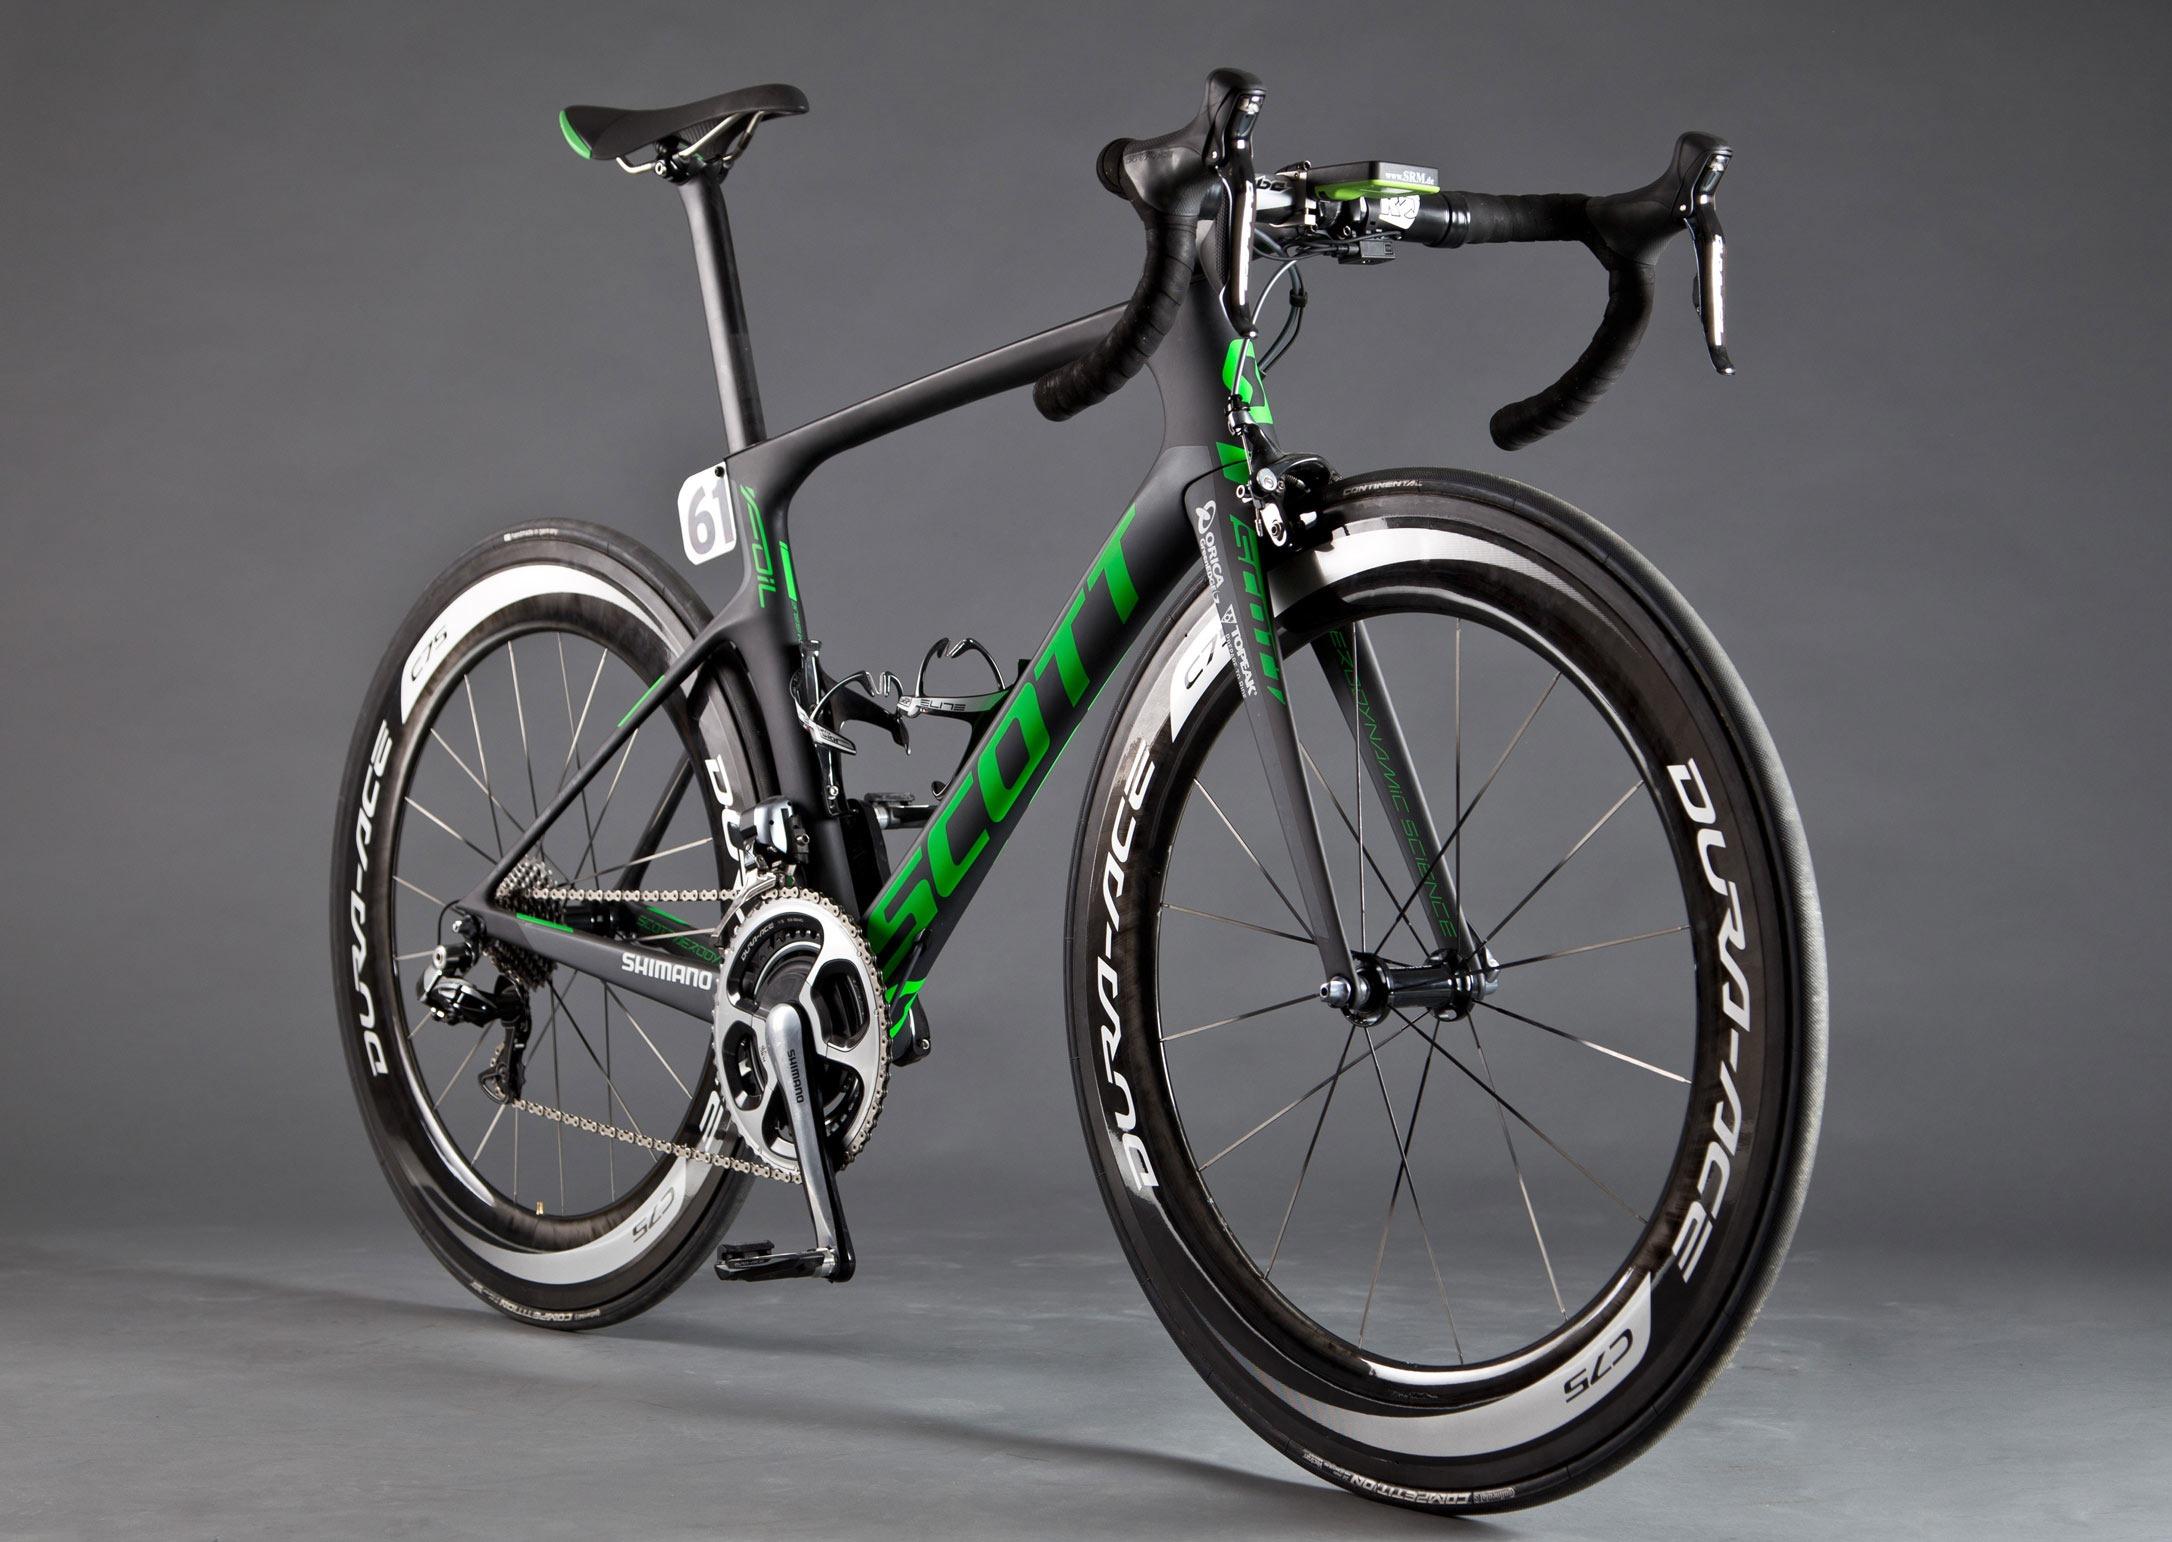 Scott Foil Pro Tour Bikes